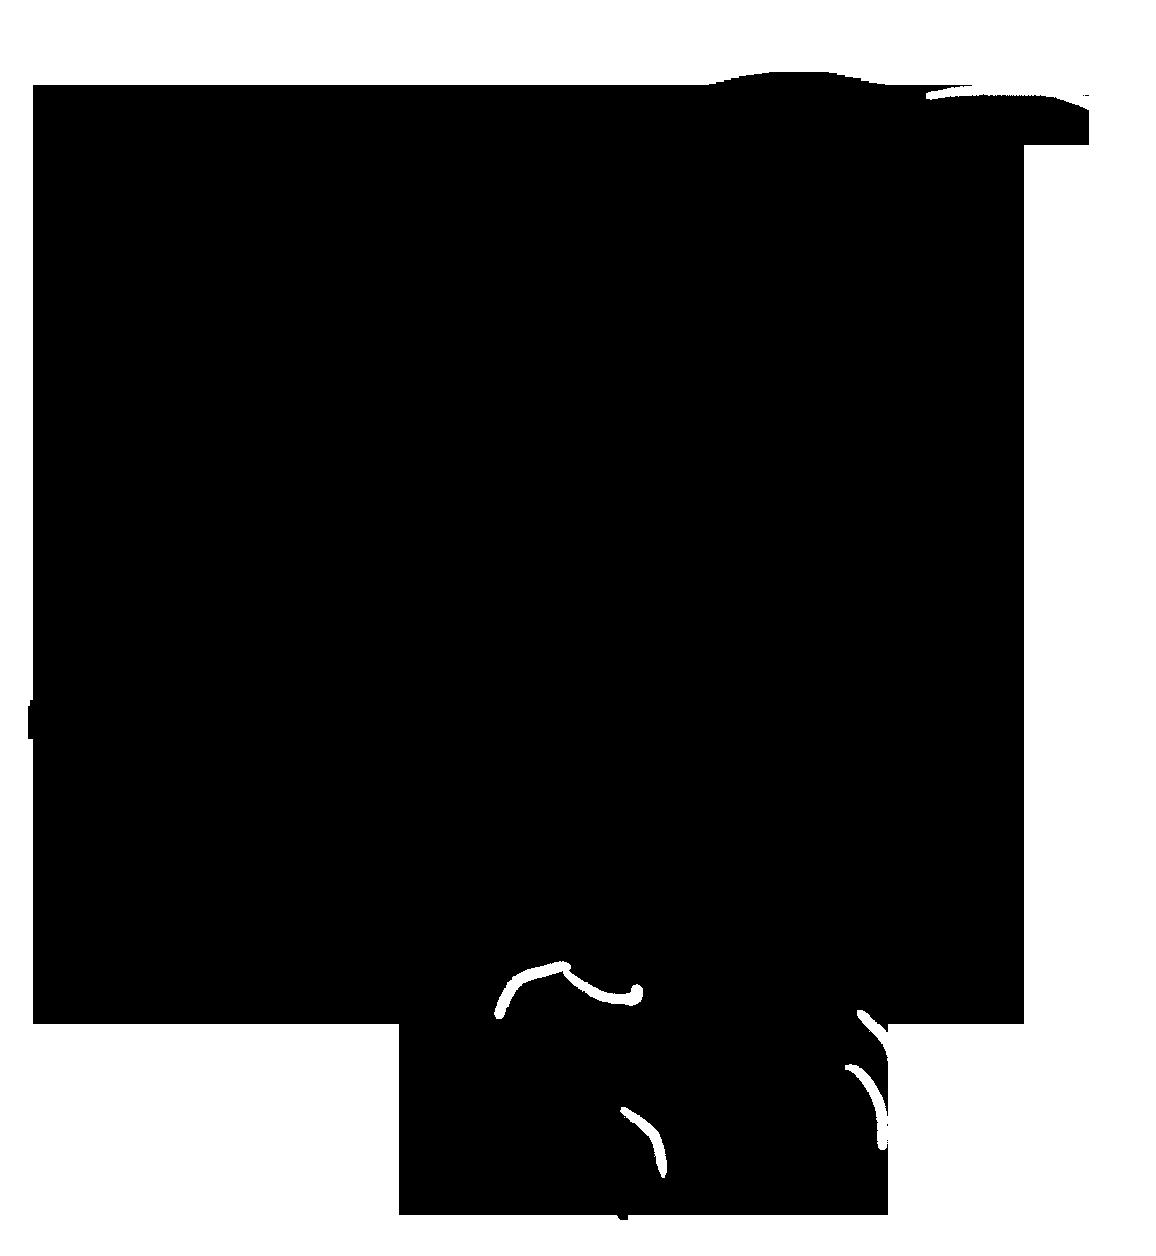 silhouette black of small standing bird